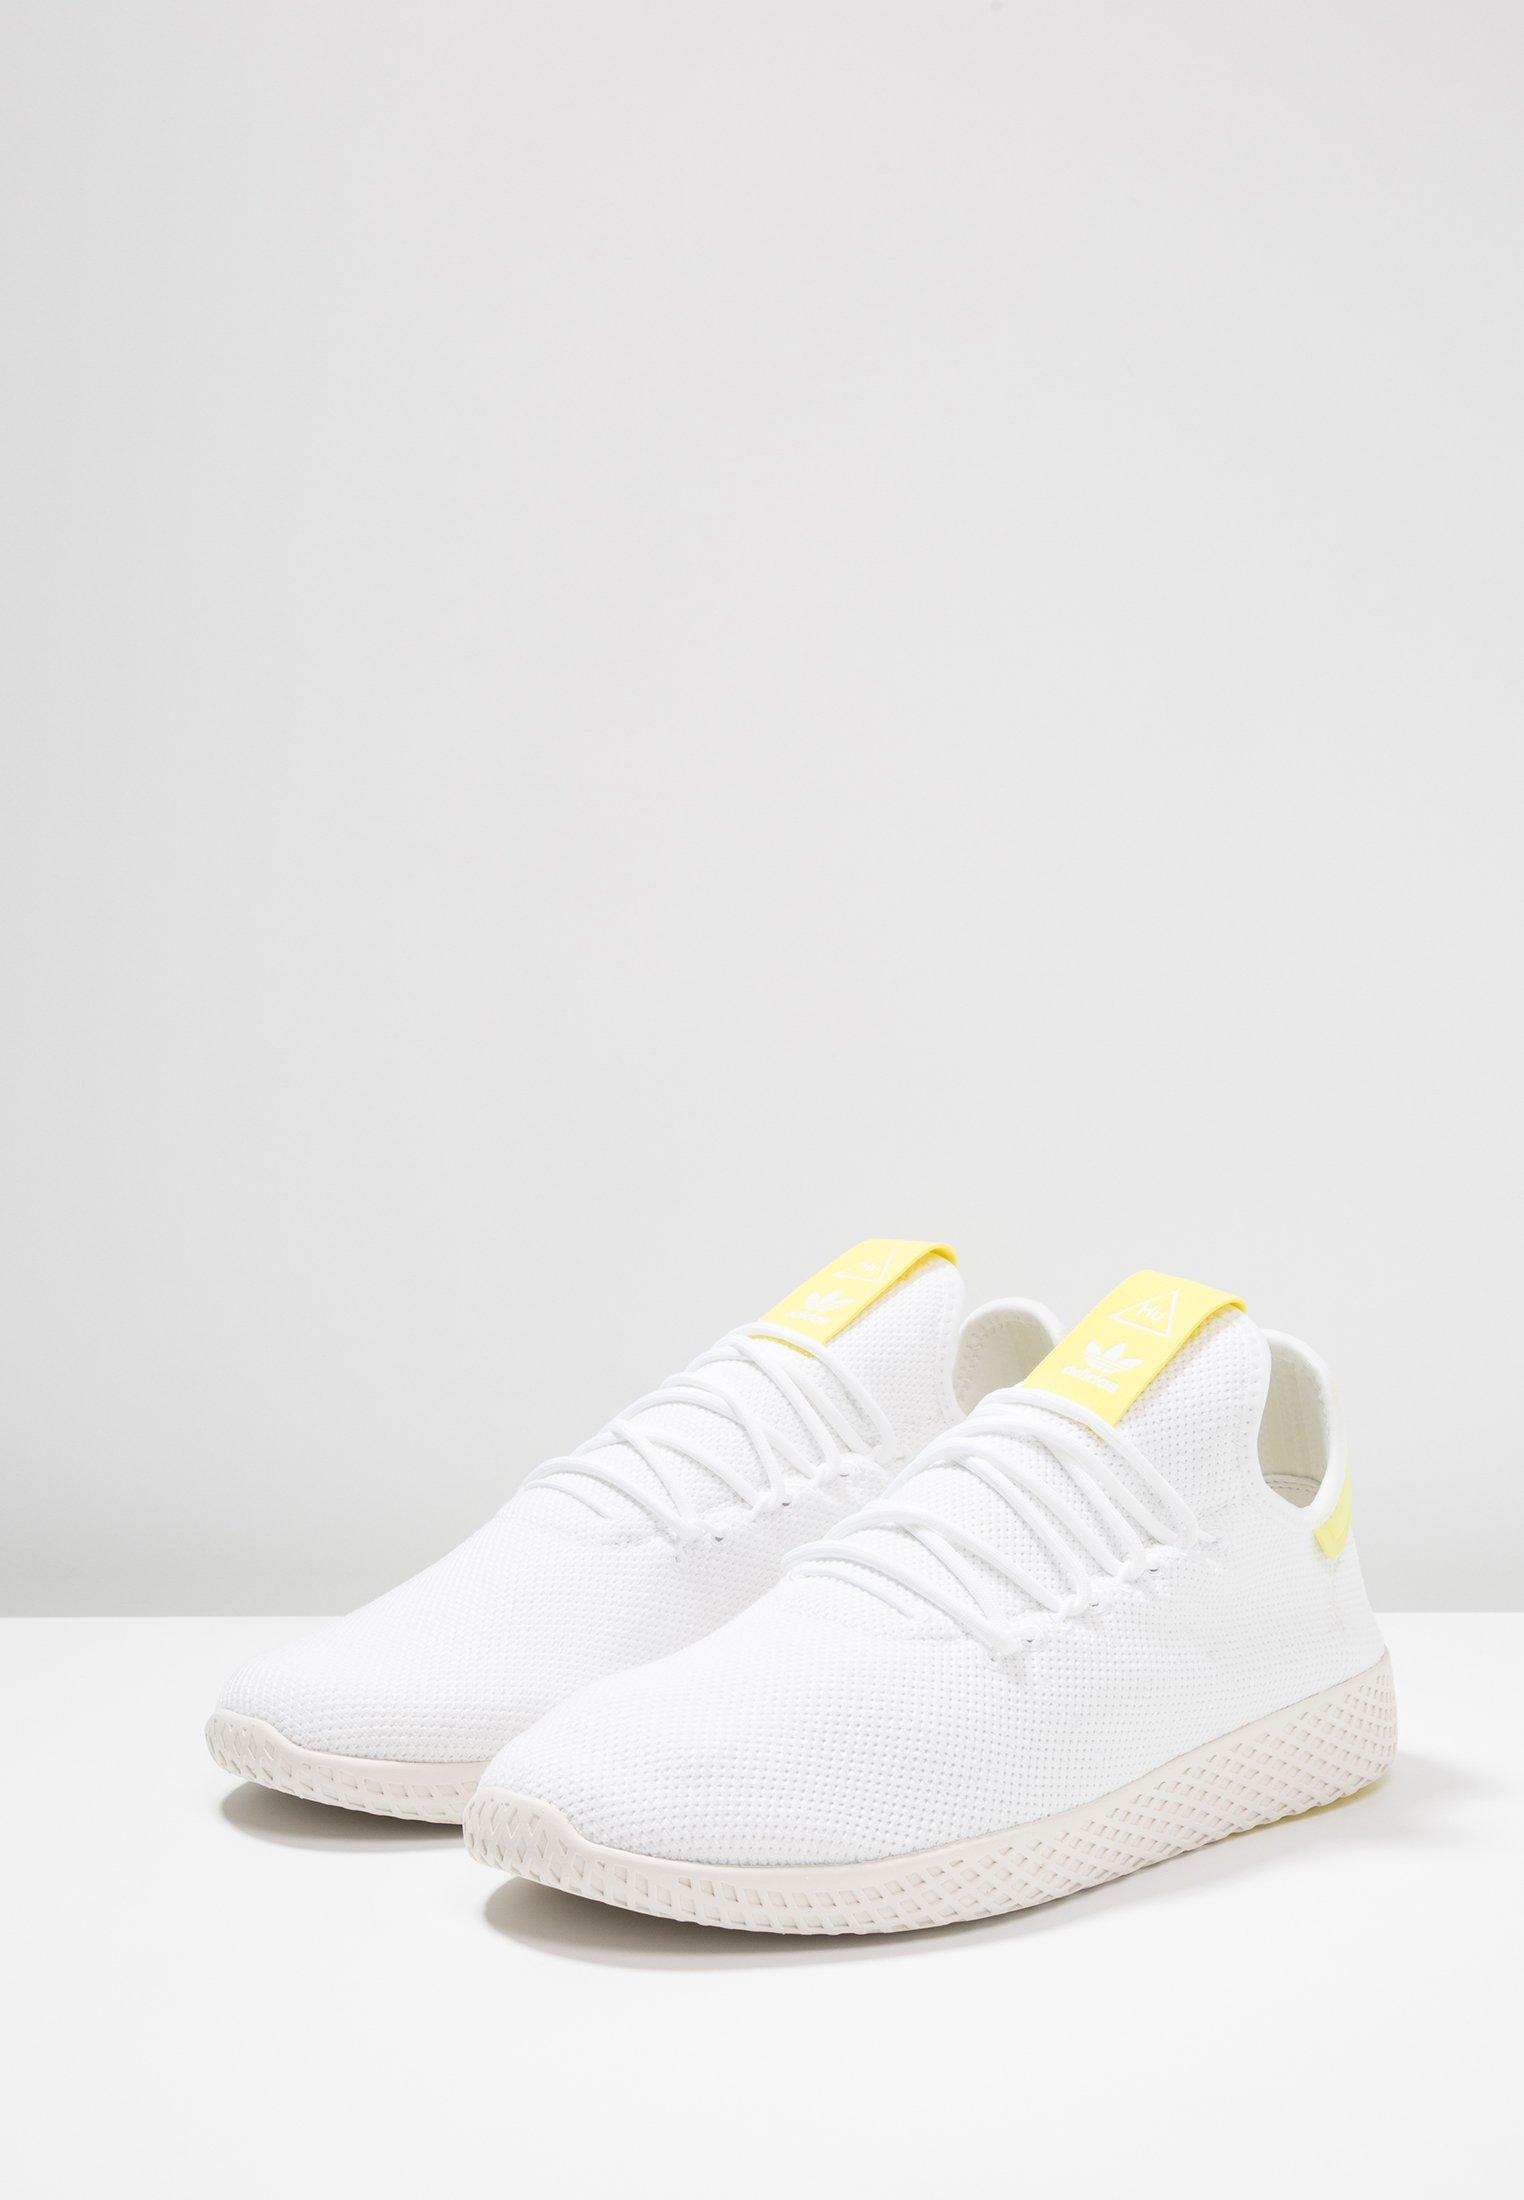 adidas Originals PW TENNIS HU Sneaker low footwear white/core white/weiß